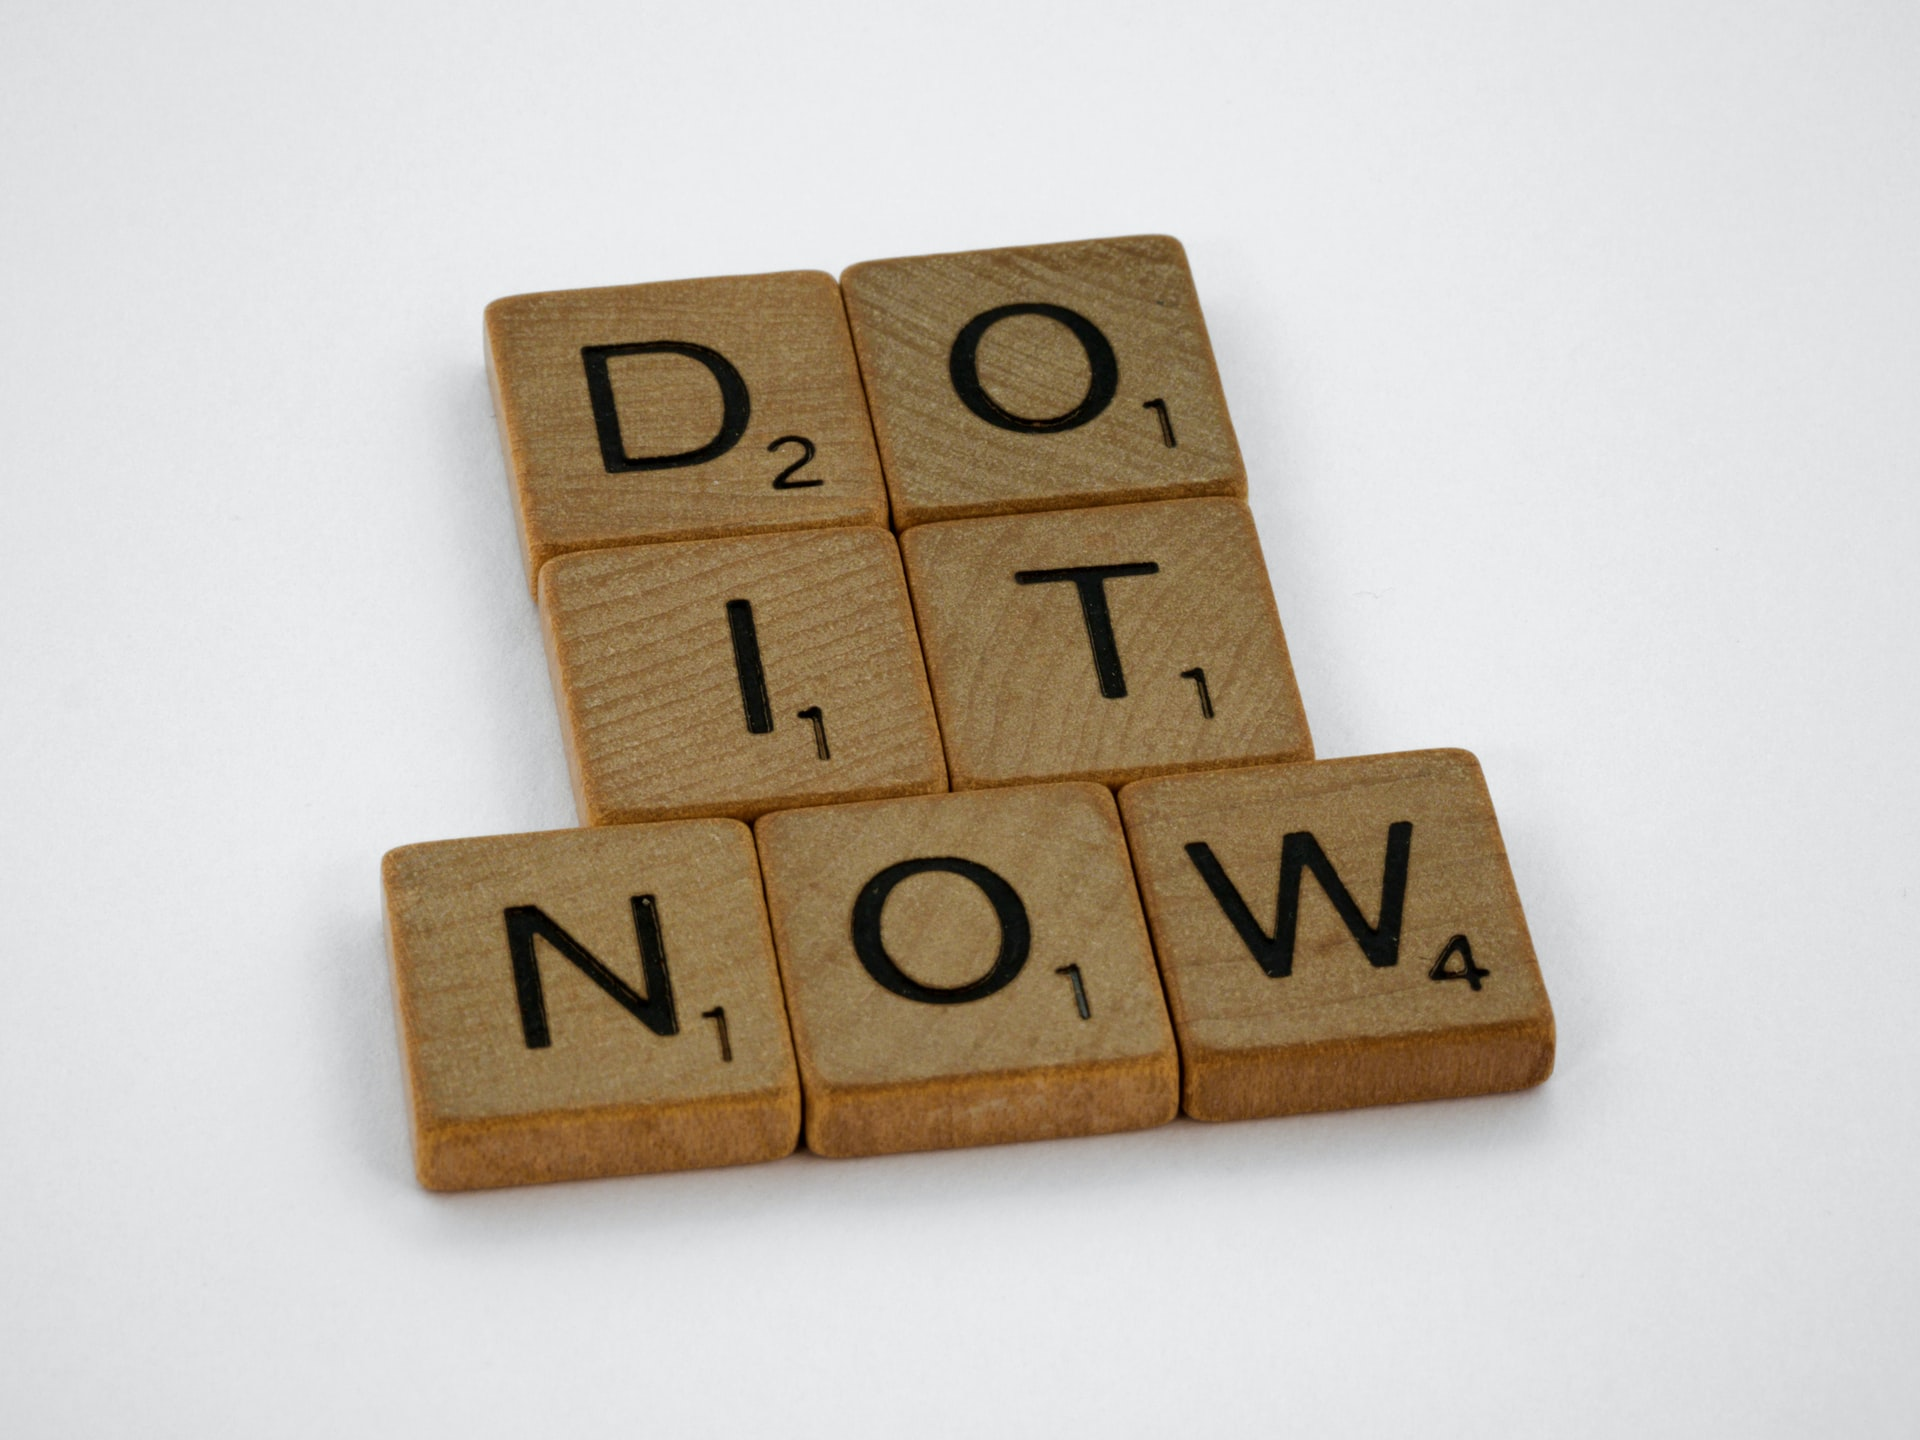 How To Get Rid Of Procrastination?